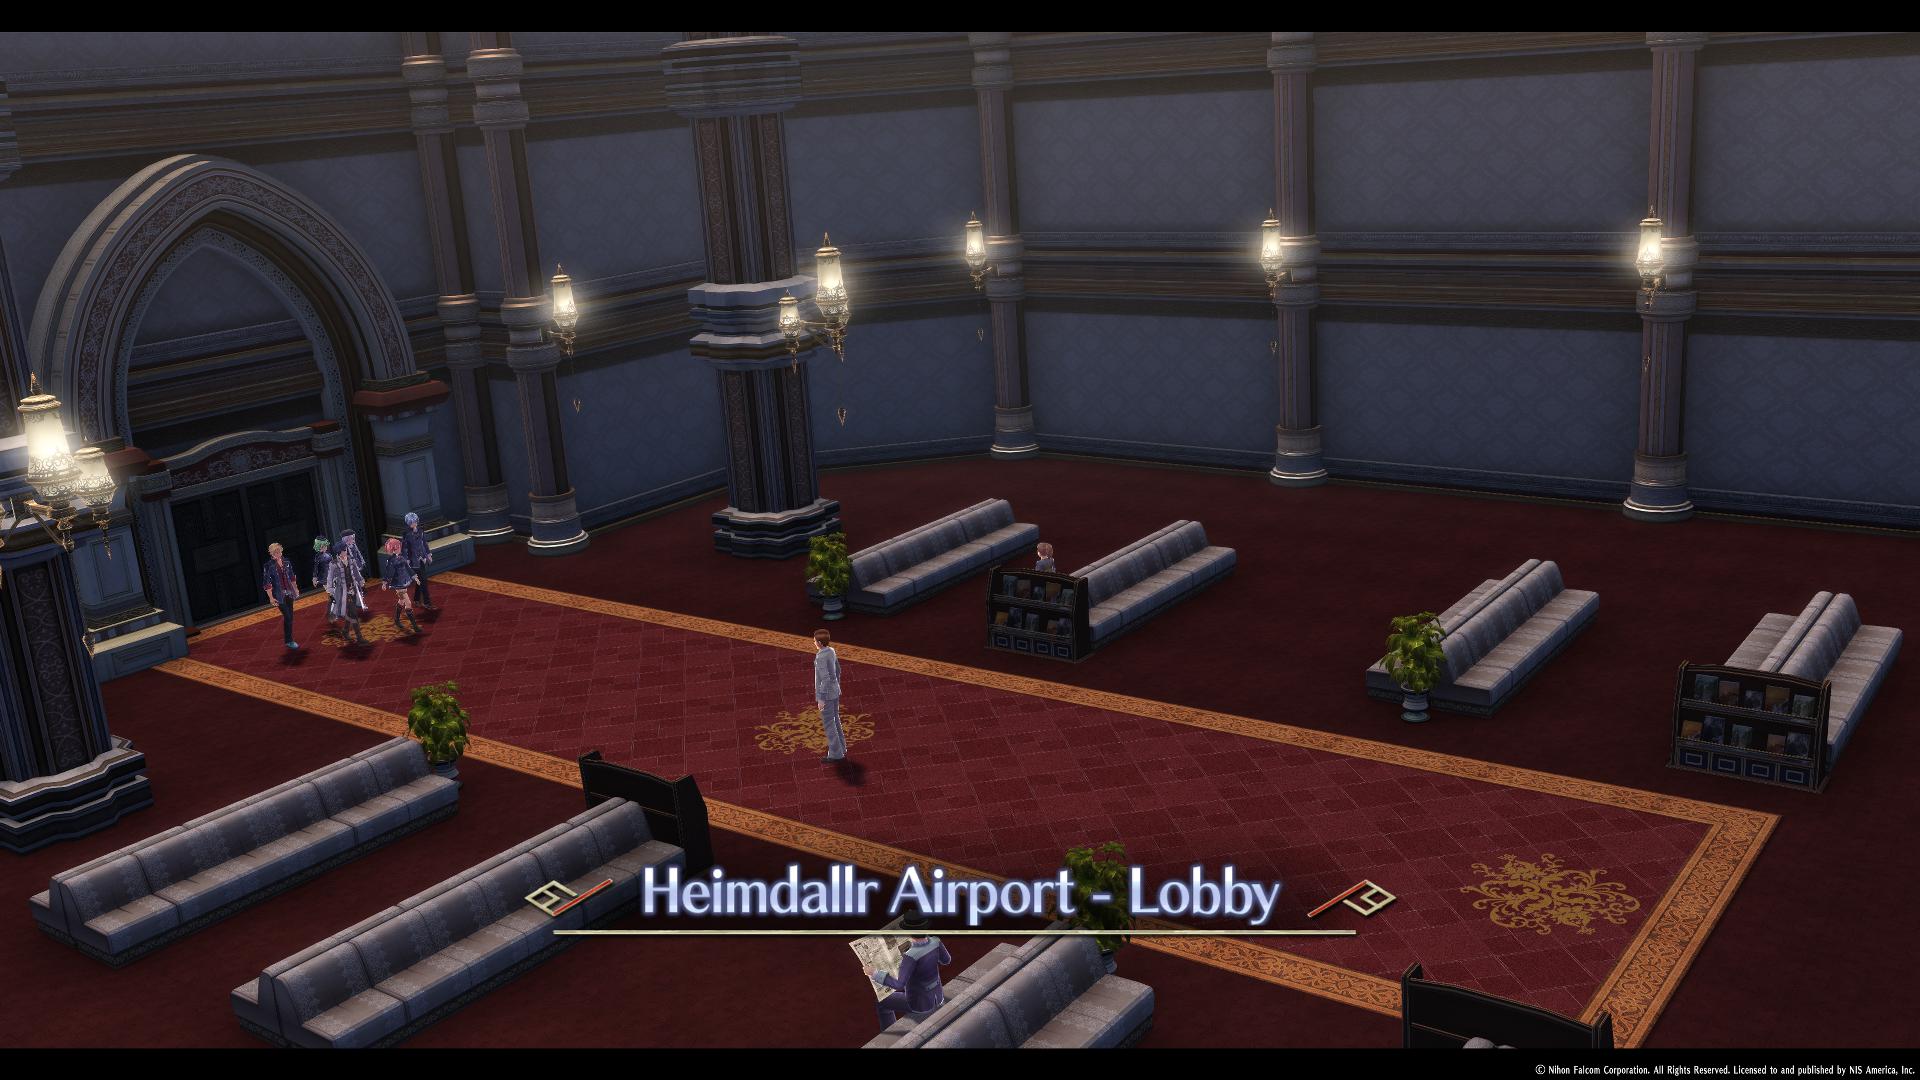 Heimdallr/Airport